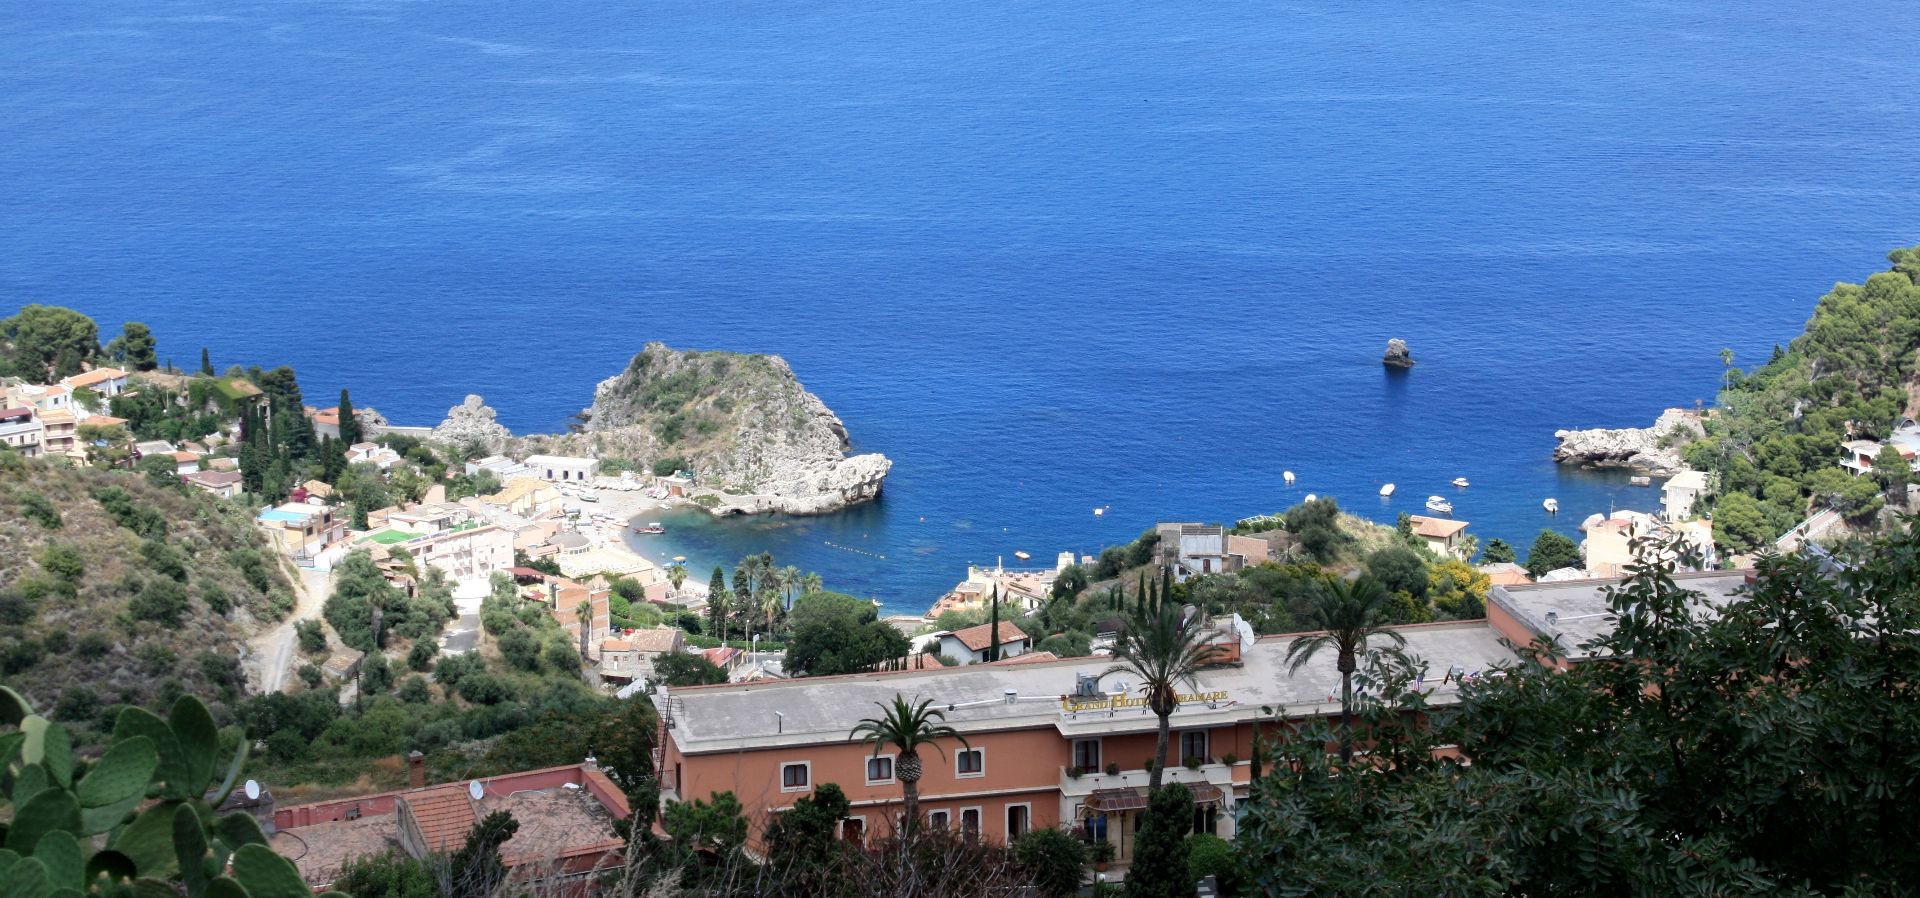 Tour in barca con aperitivo da Giardini Naxos a Taormina